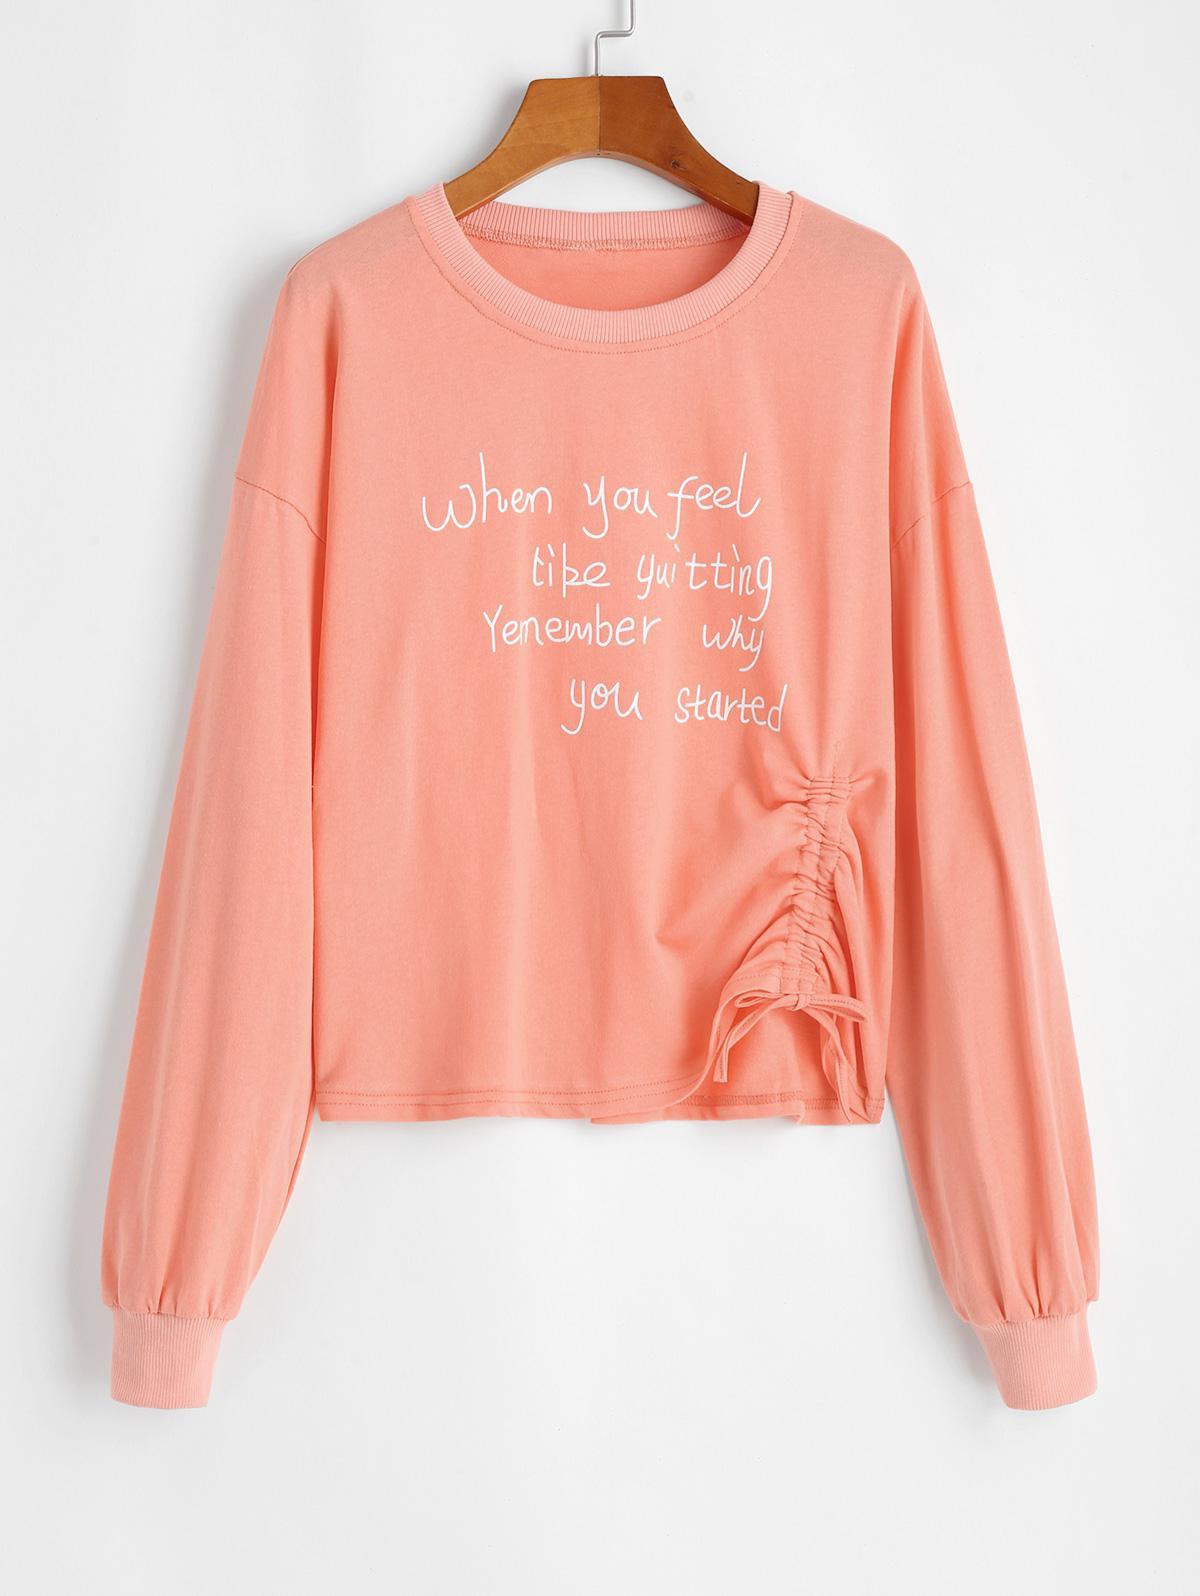 Cinched Slogan Graphic Pullover Sweatshirt